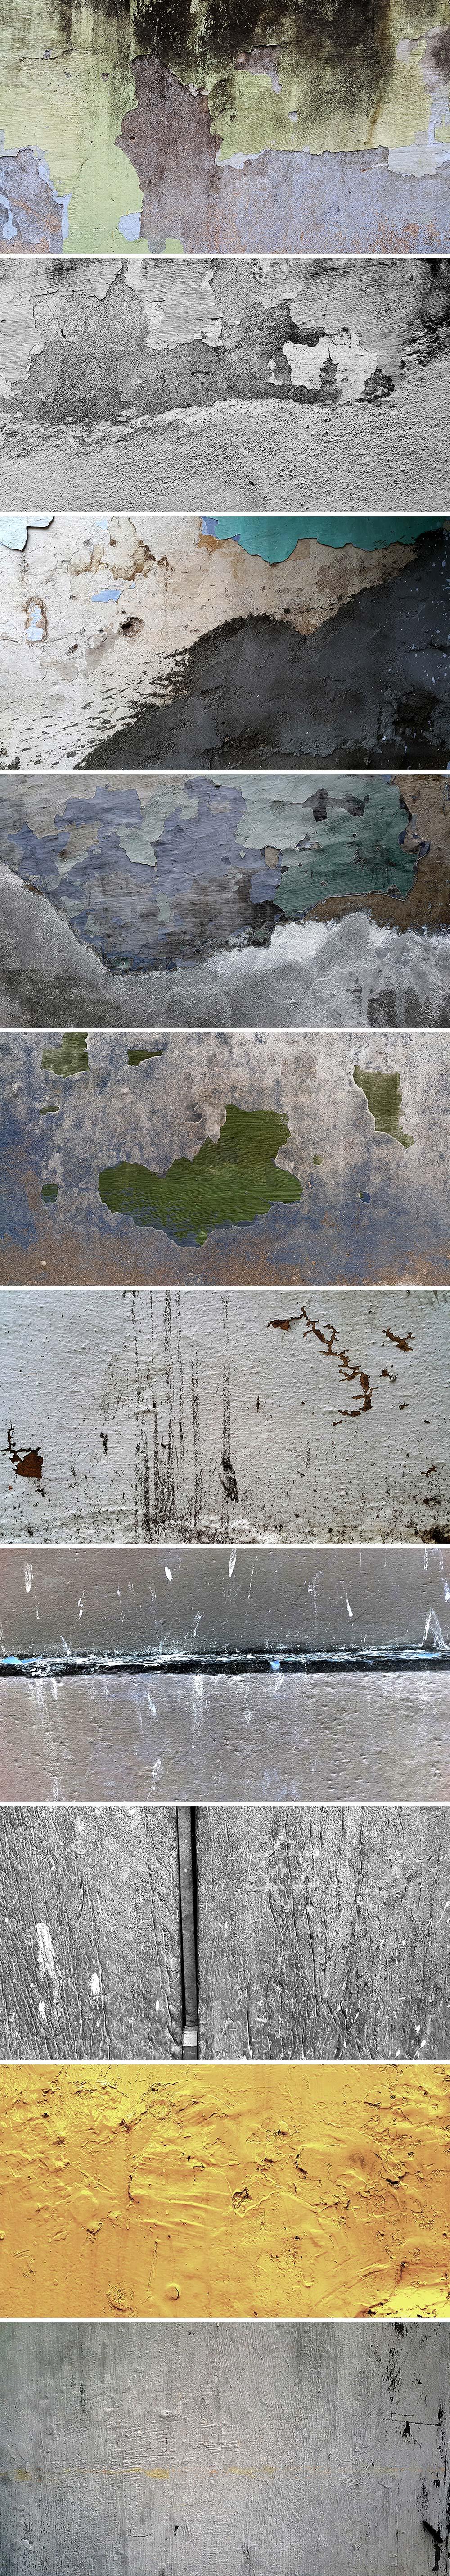 grunge-wall-textures